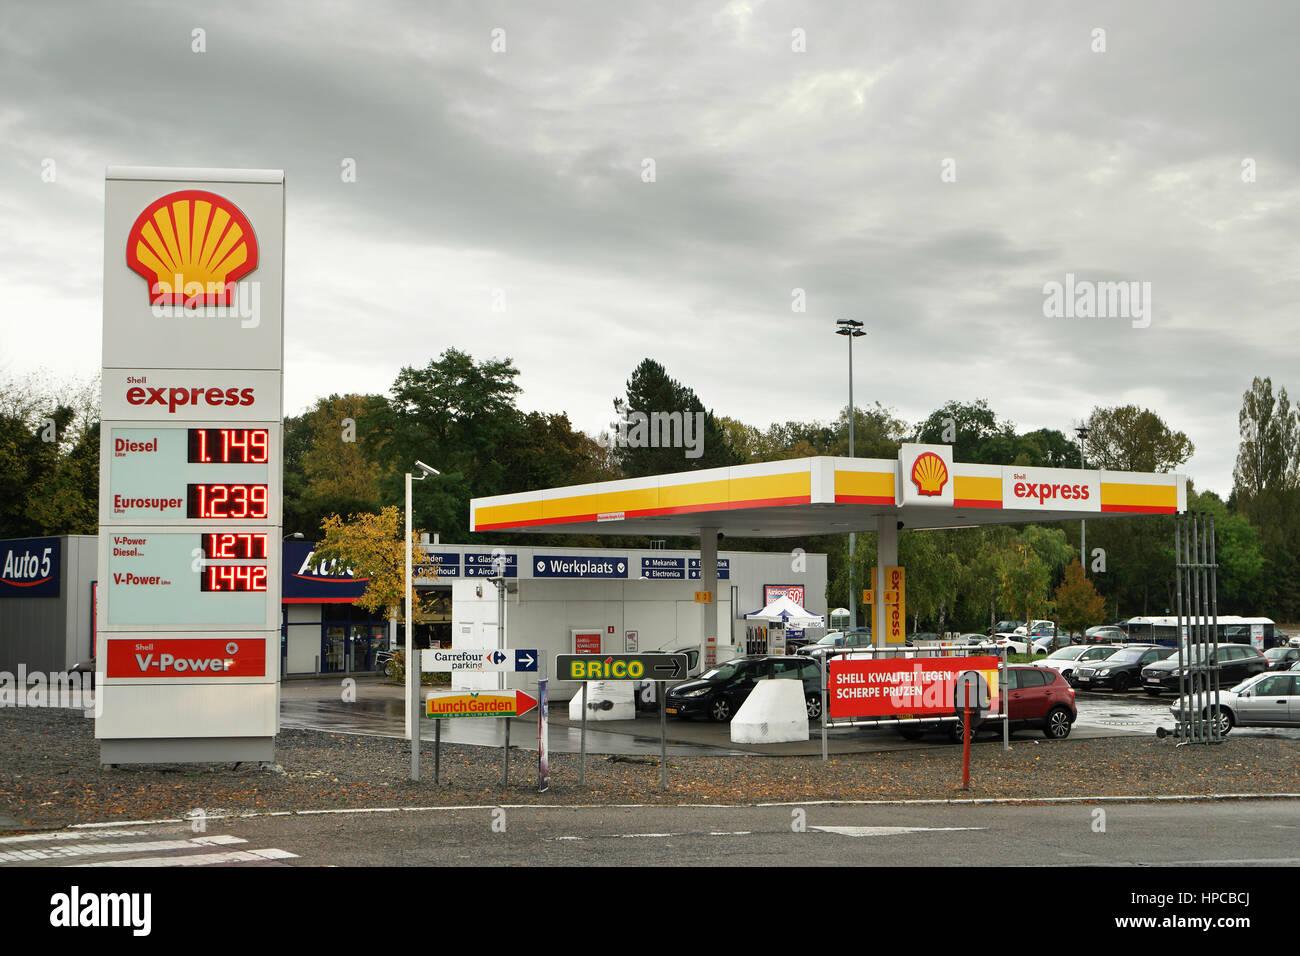 c354e82eda2 Shell Station Stock Photos & Shell Station Stock Images - Alamy